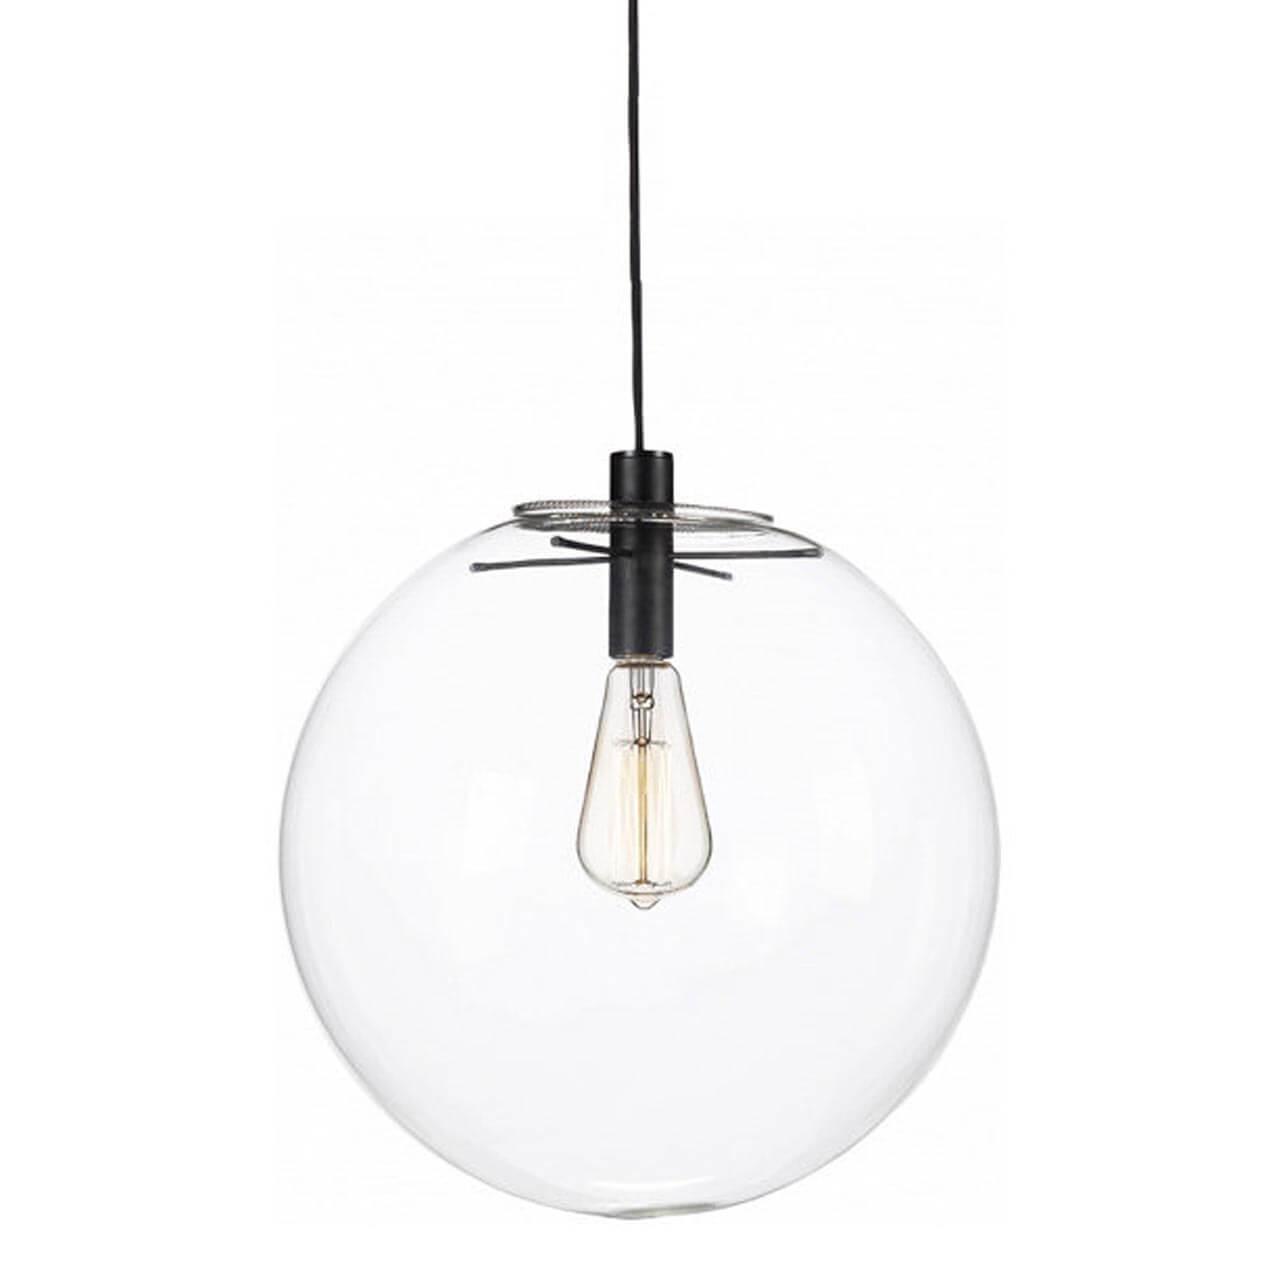 Светильник Kink Light 07562-25,21 Меркурий